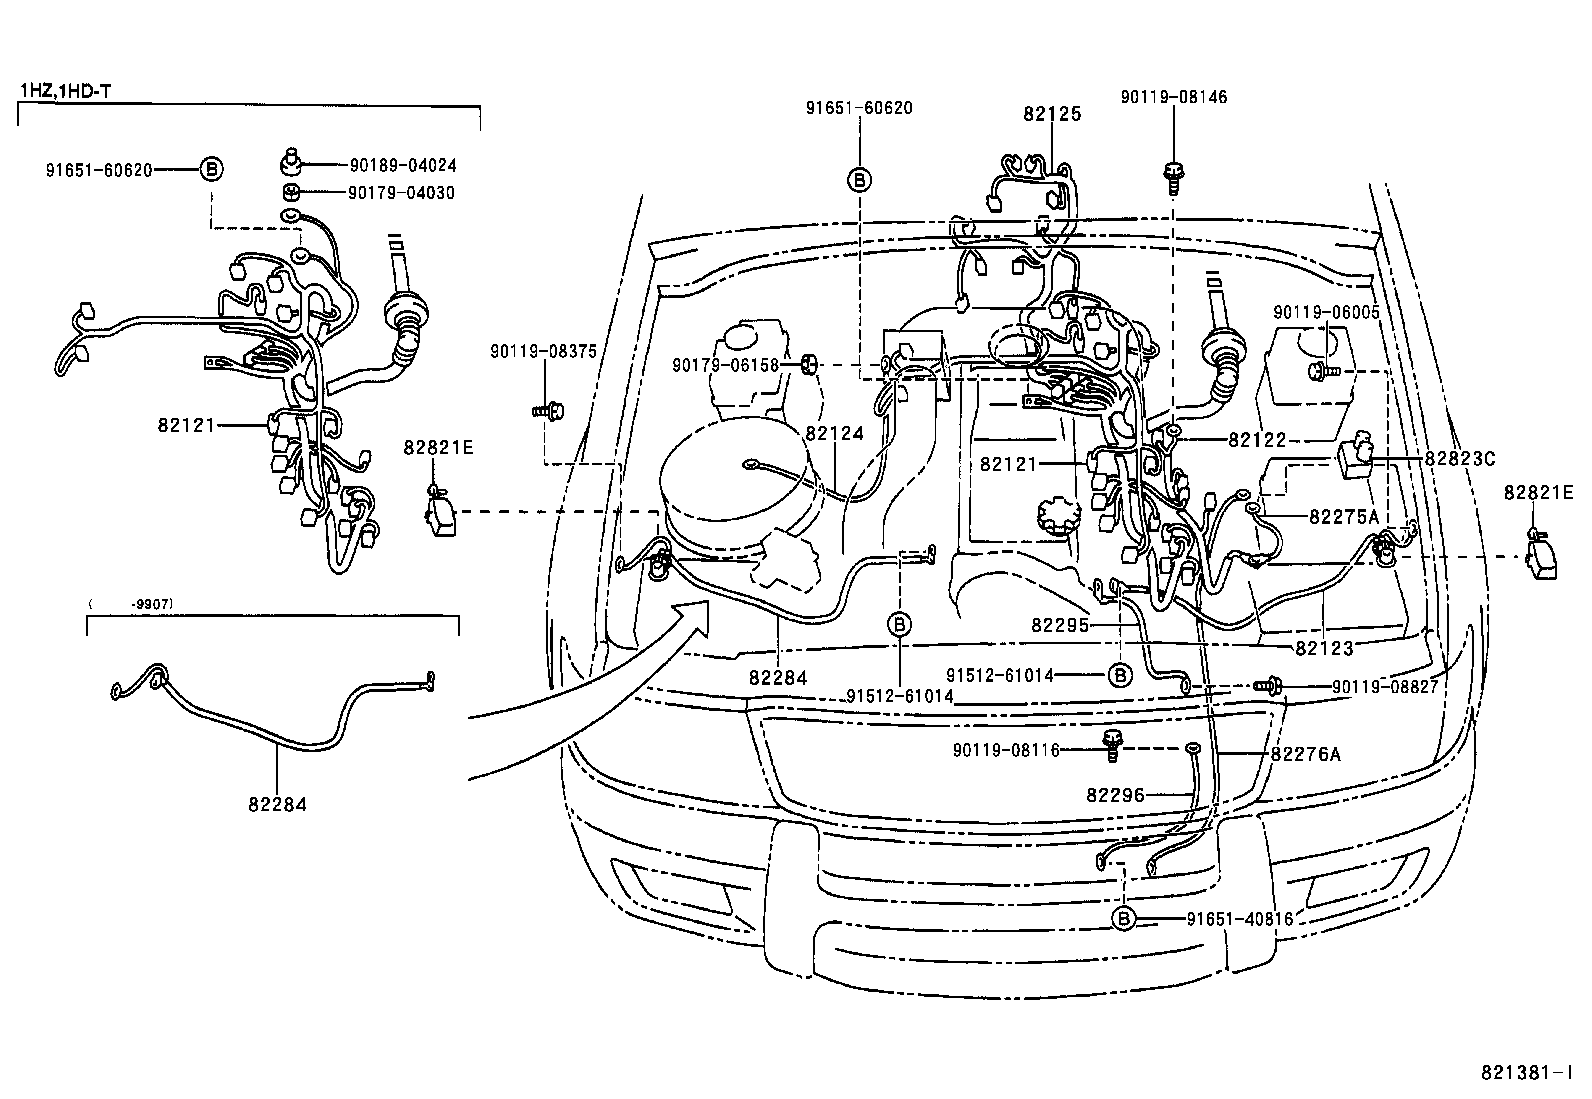 toyota land cruiser 100hdj100l-gnpex - electrical